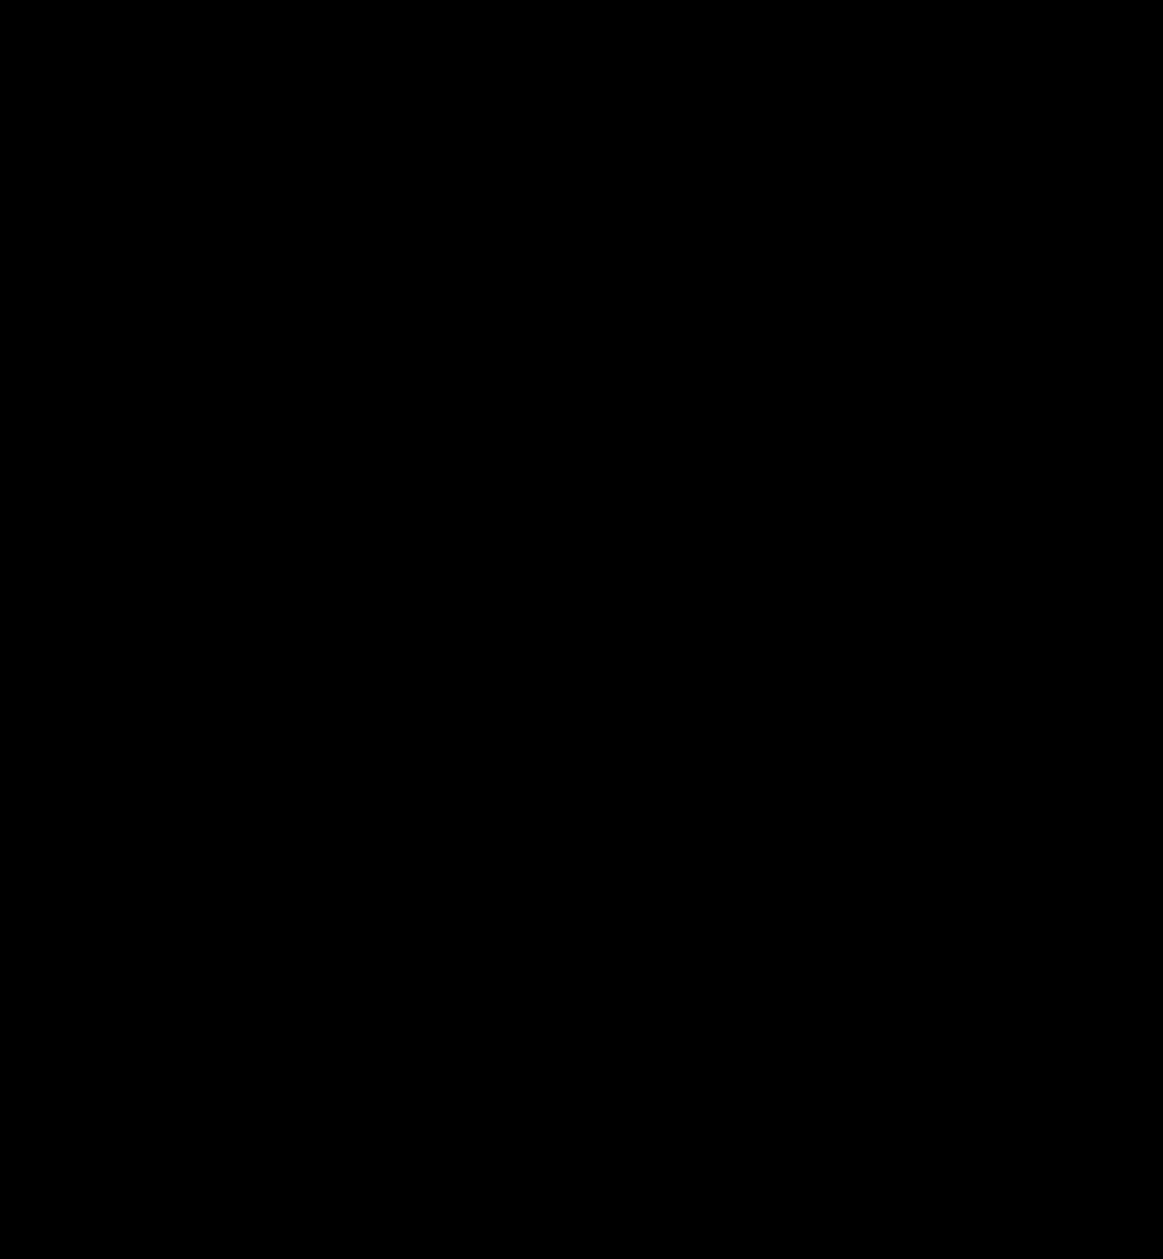 HG_graph1.png